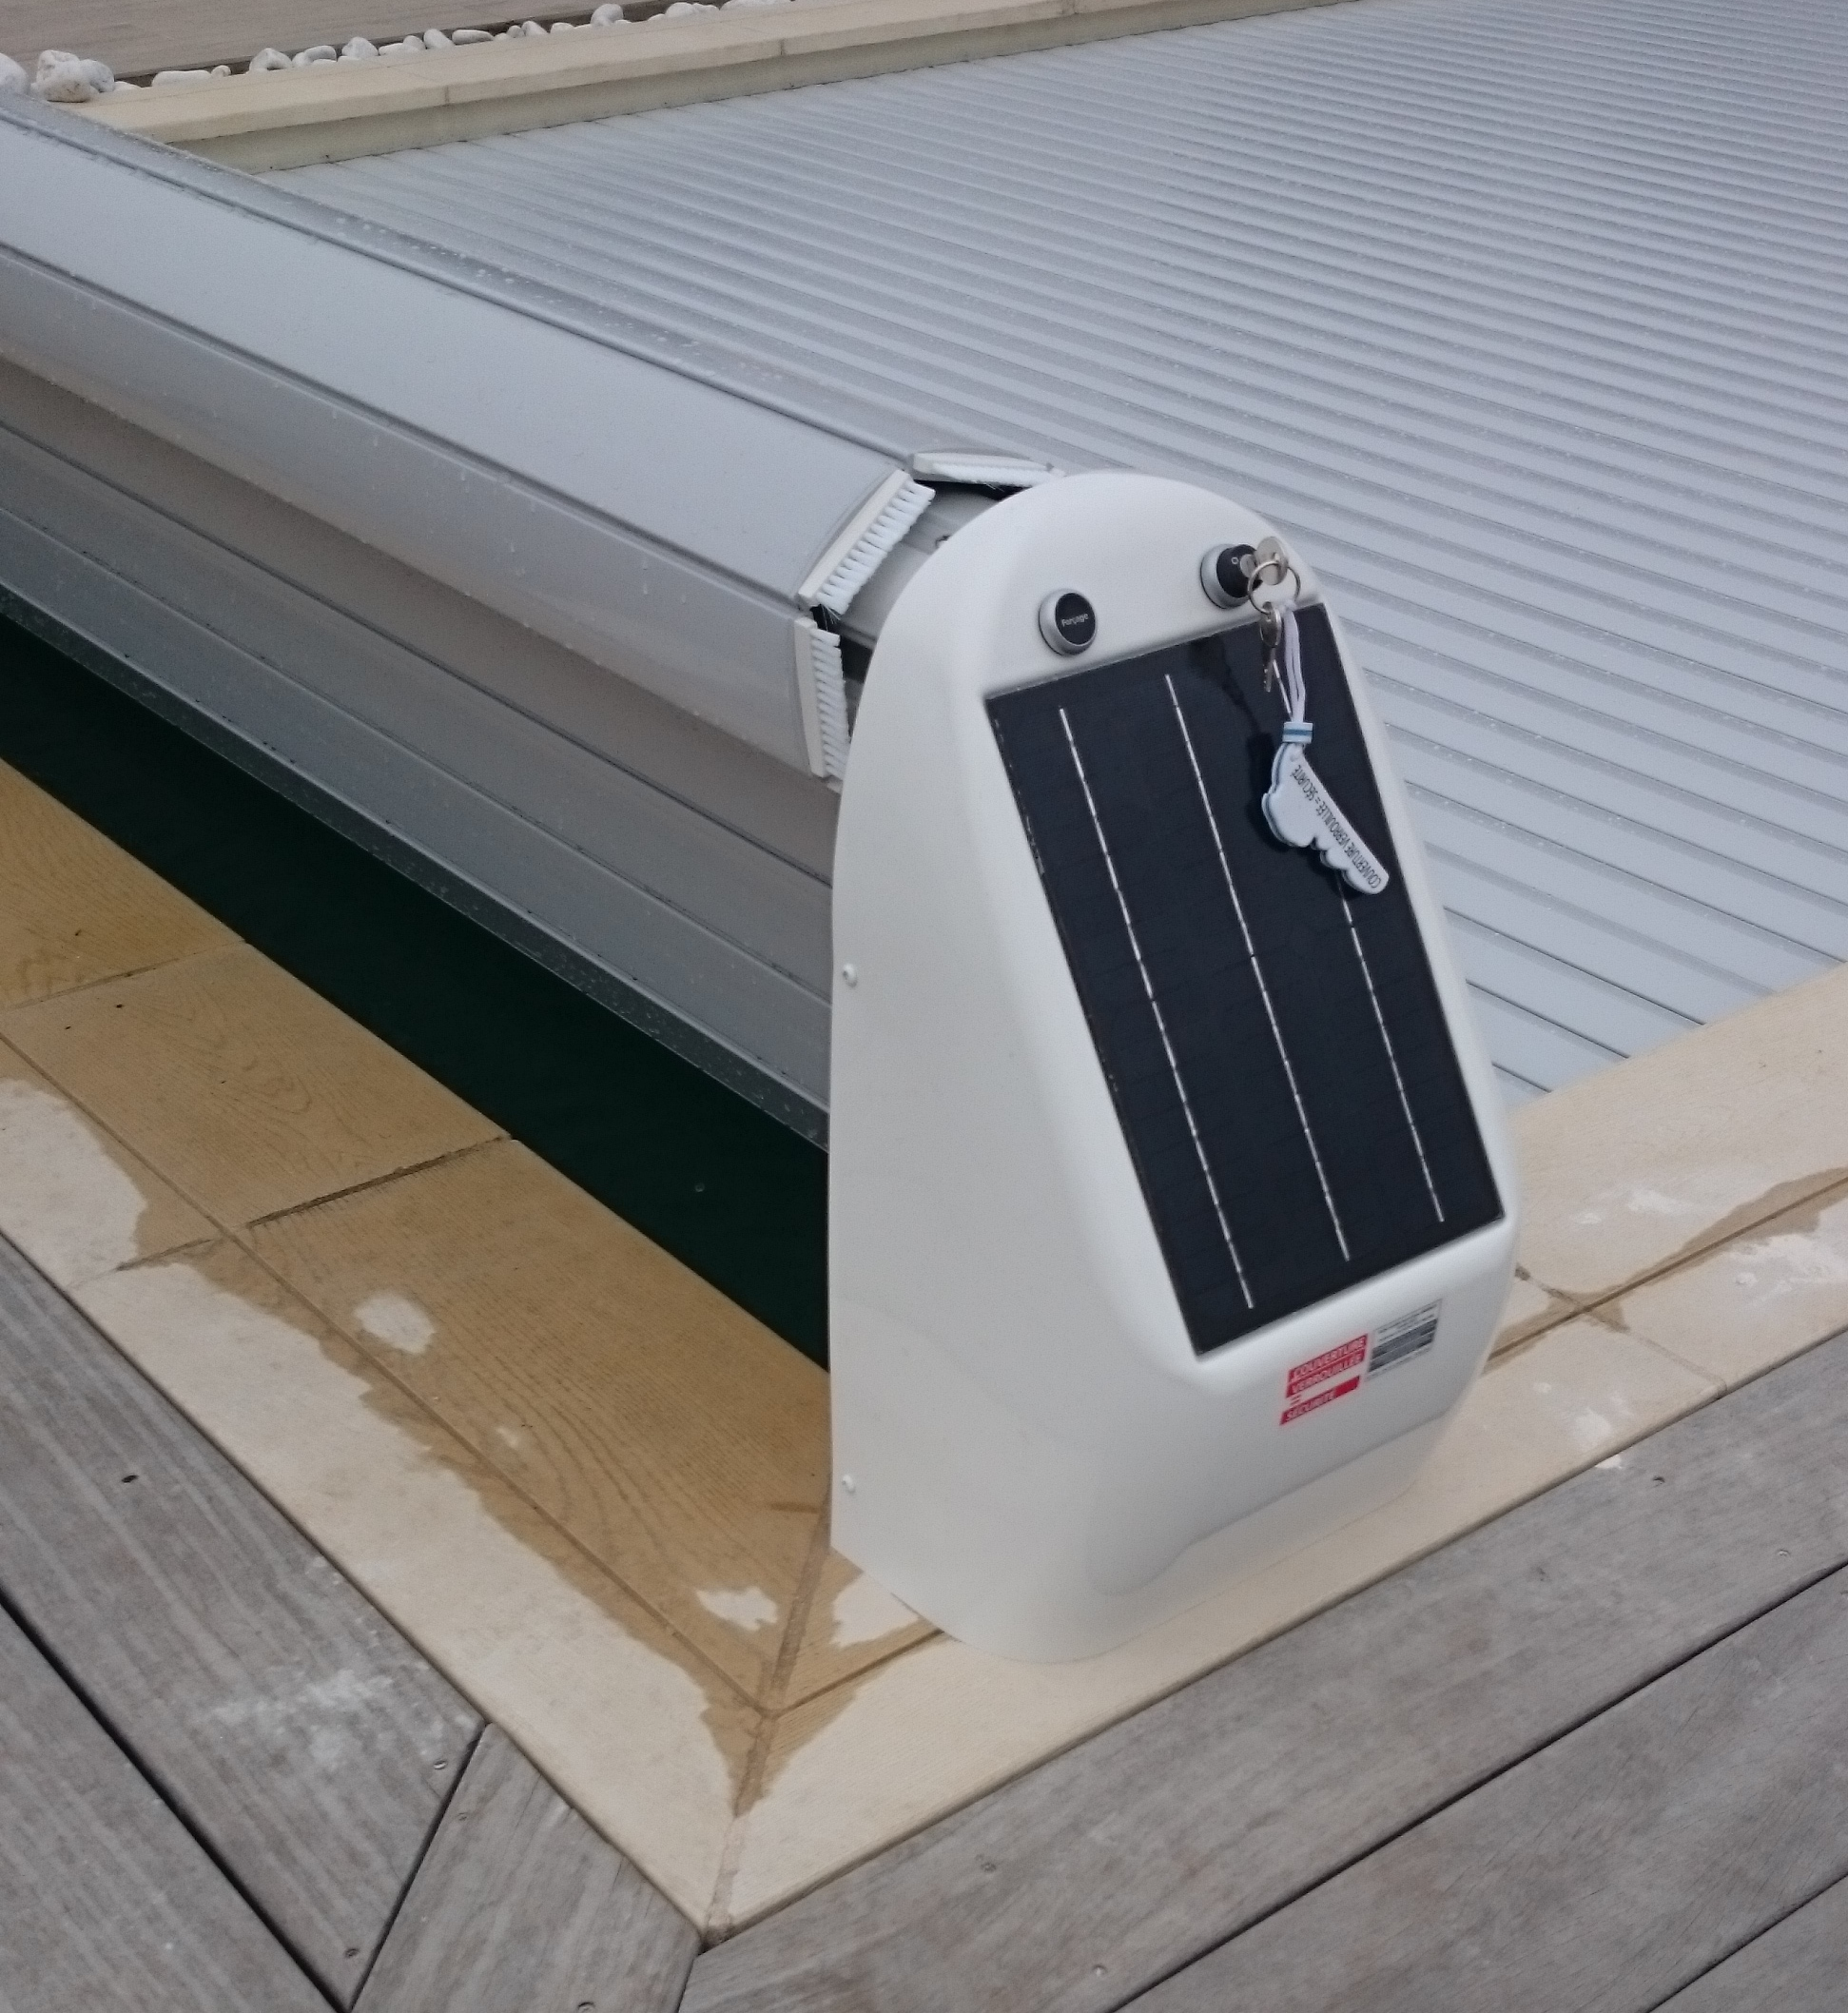 volet roulant de piscine hors sol solaire coverline. Black Bedroom Furniture Sets. Home Design Ideas